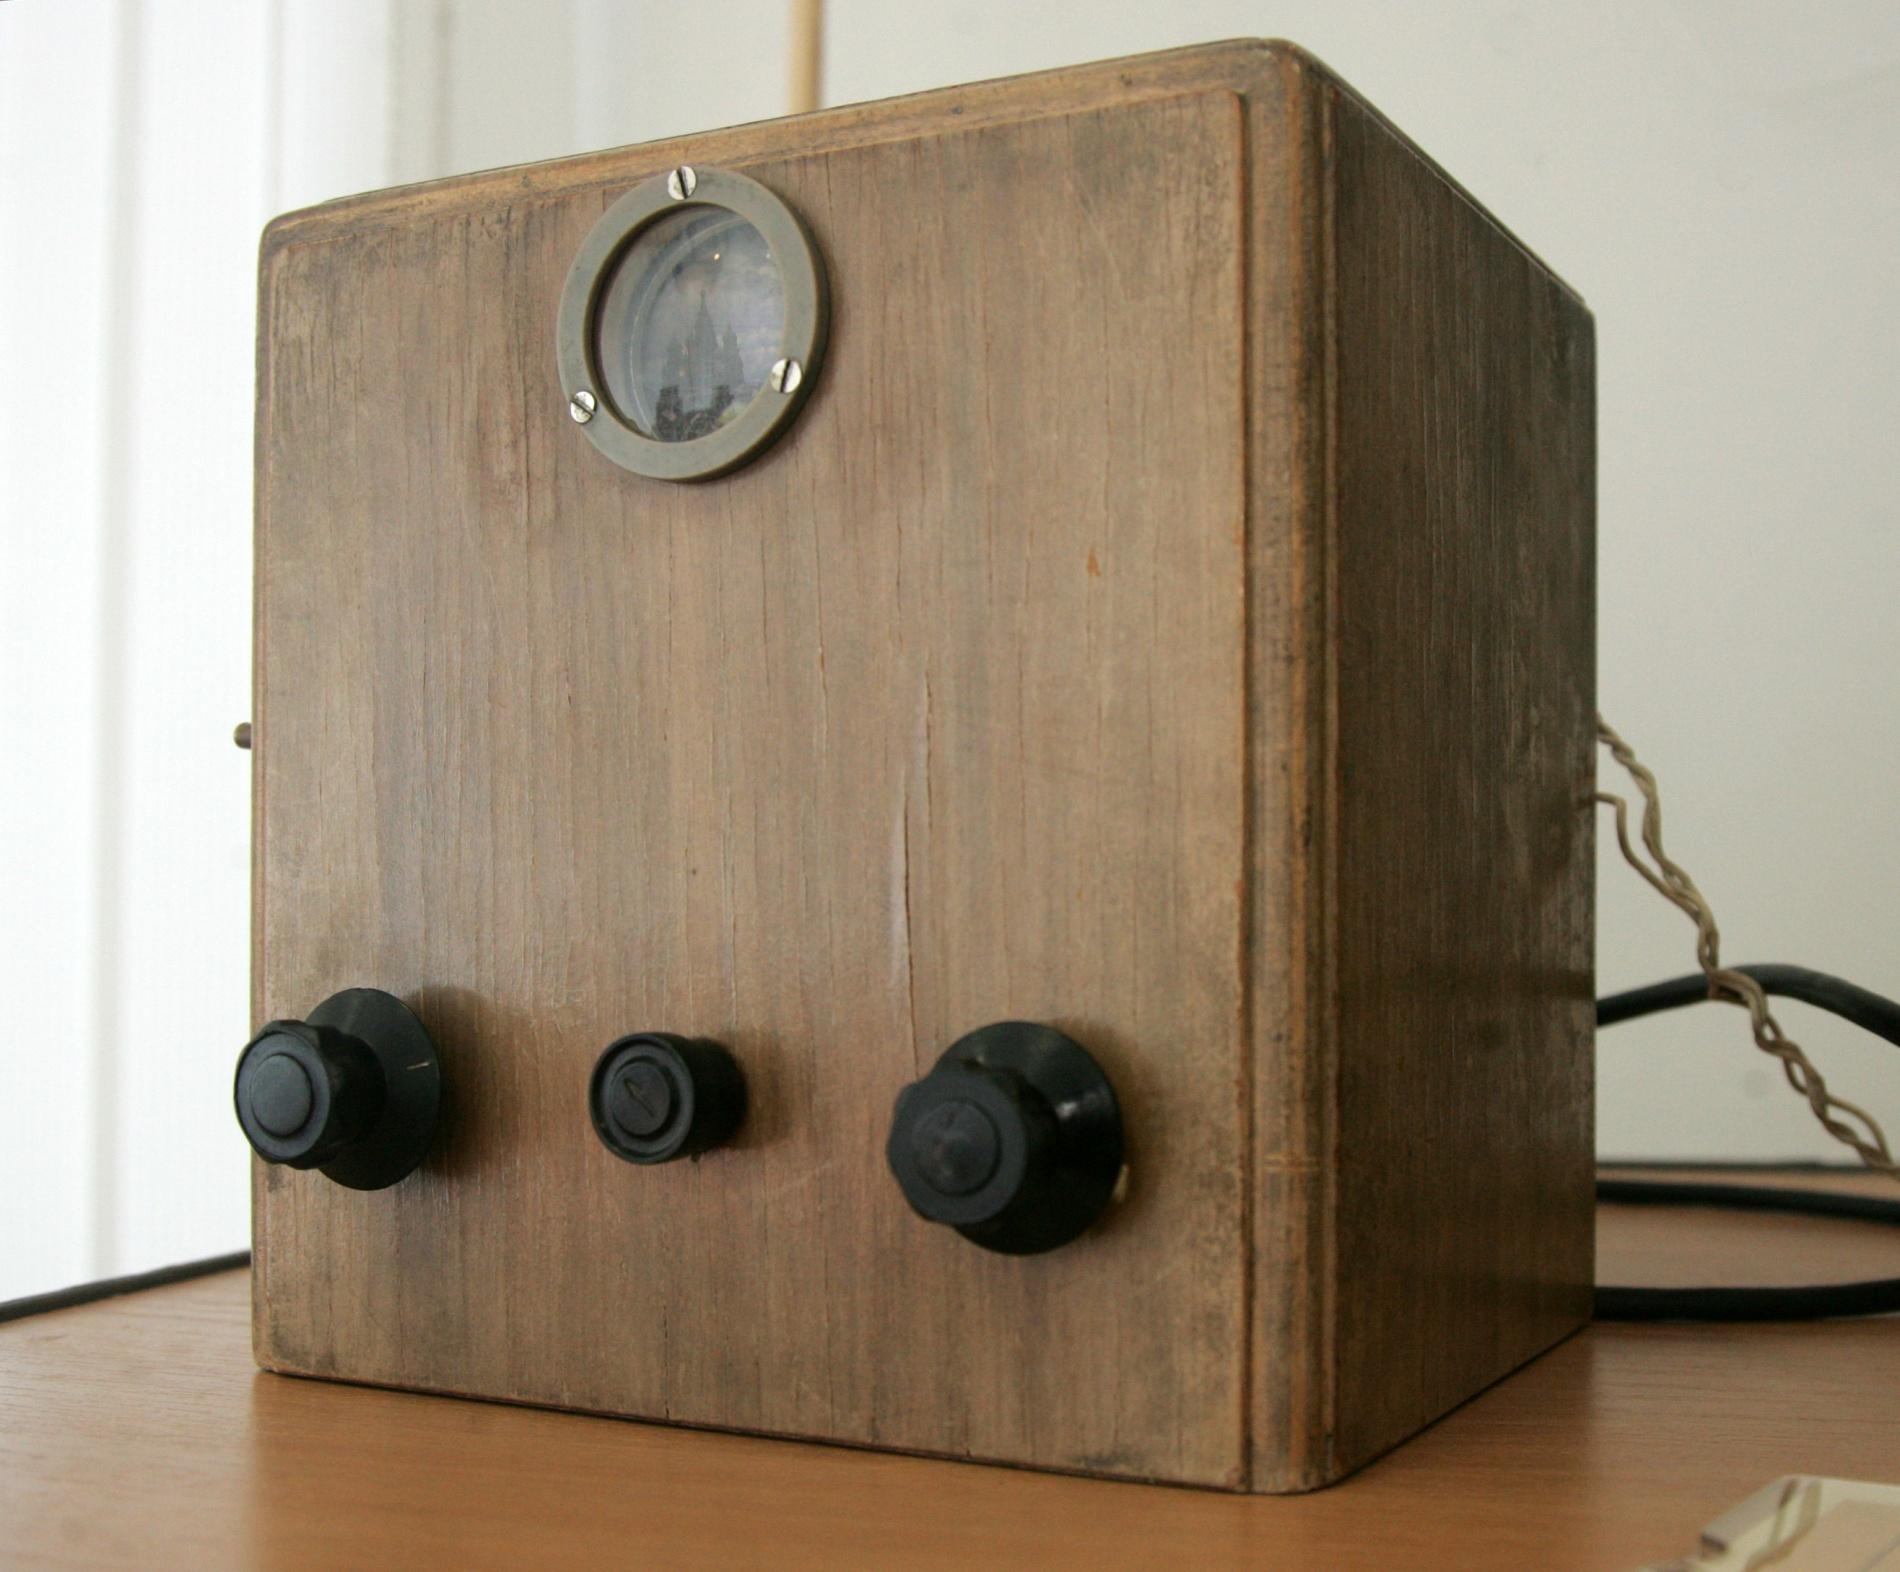 Механический телевизор Б-2, 30-е годы XX века